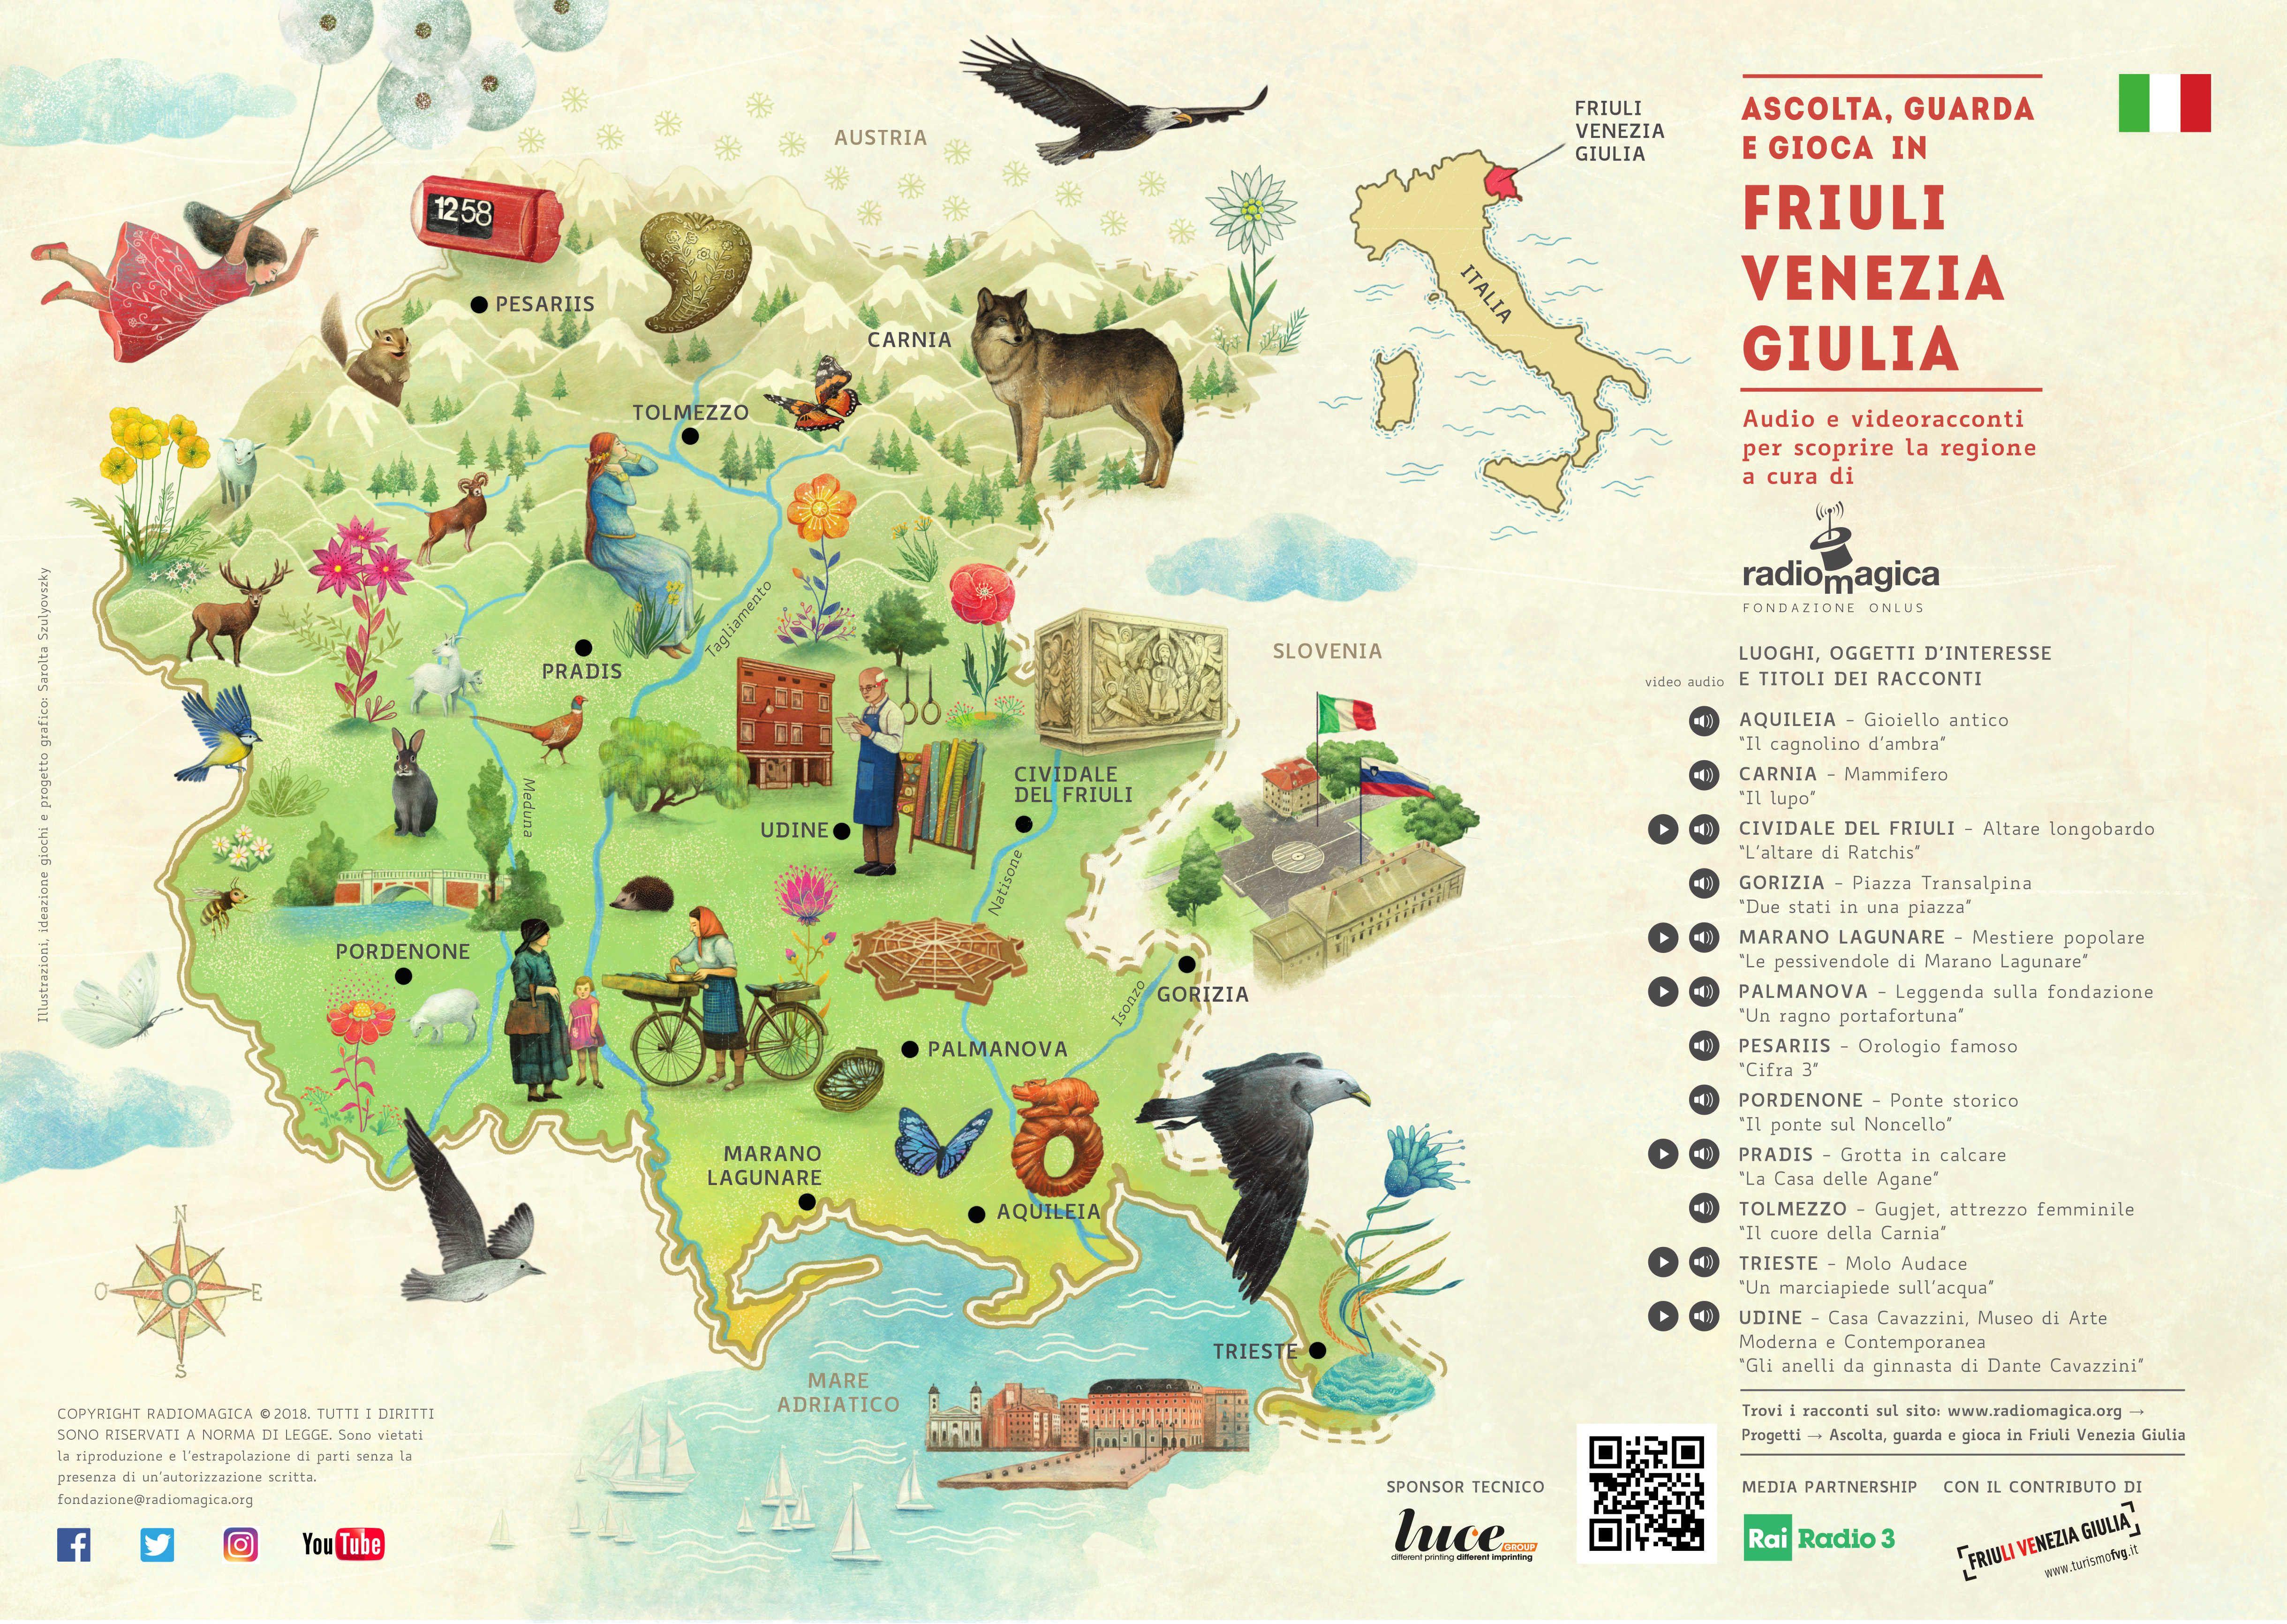 Regione Friuli Venezia Giulia Cartina.189 Friuli Venezia Giulia Ideas In 2021 Friuli Venezia Giulia Udine Aviano Italy